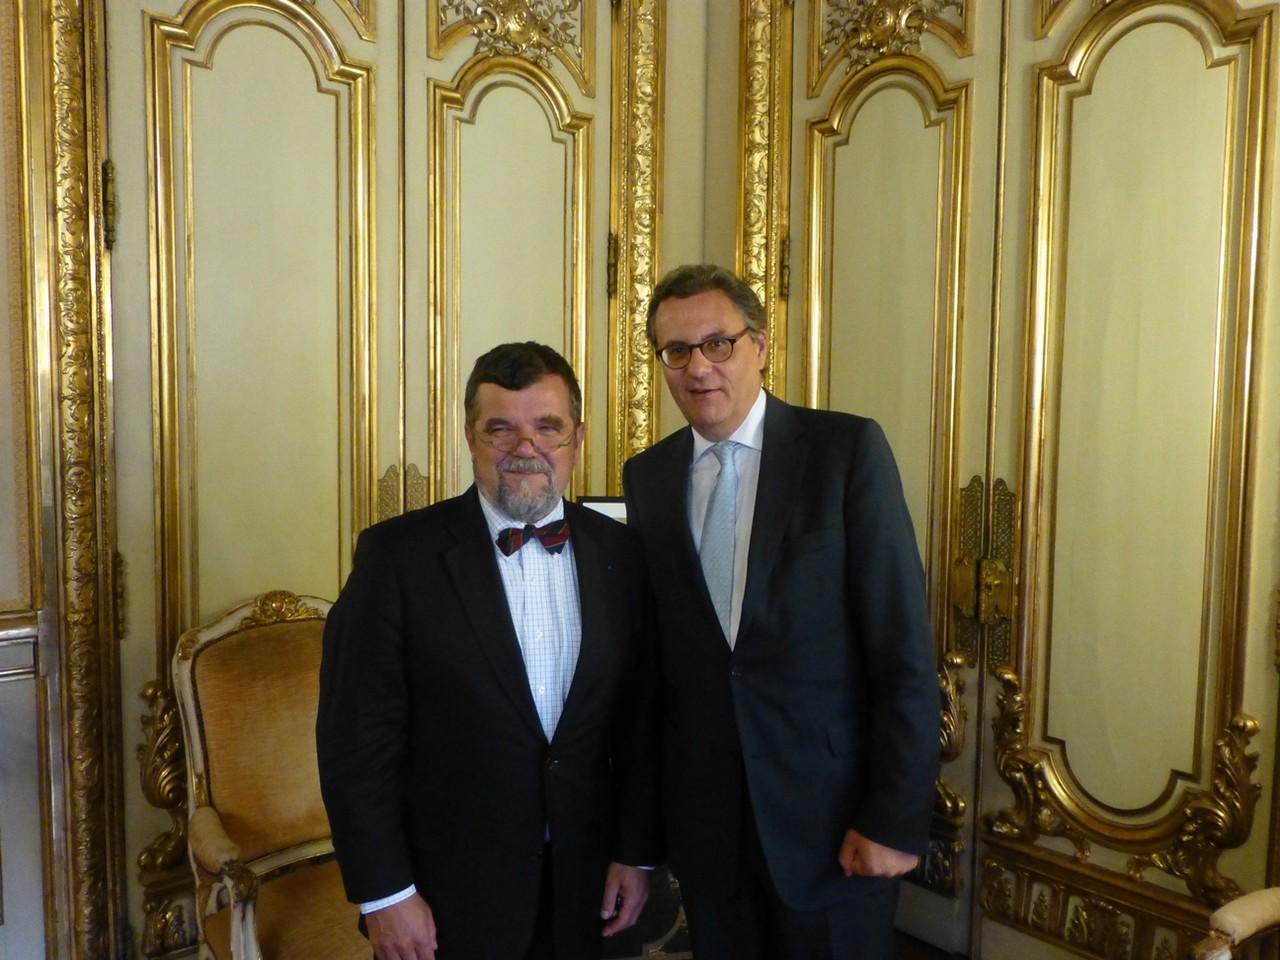 Paris, mit dem Präsidenten der IHK Paris Ile-de-France, Pierre-Antoine Gaill